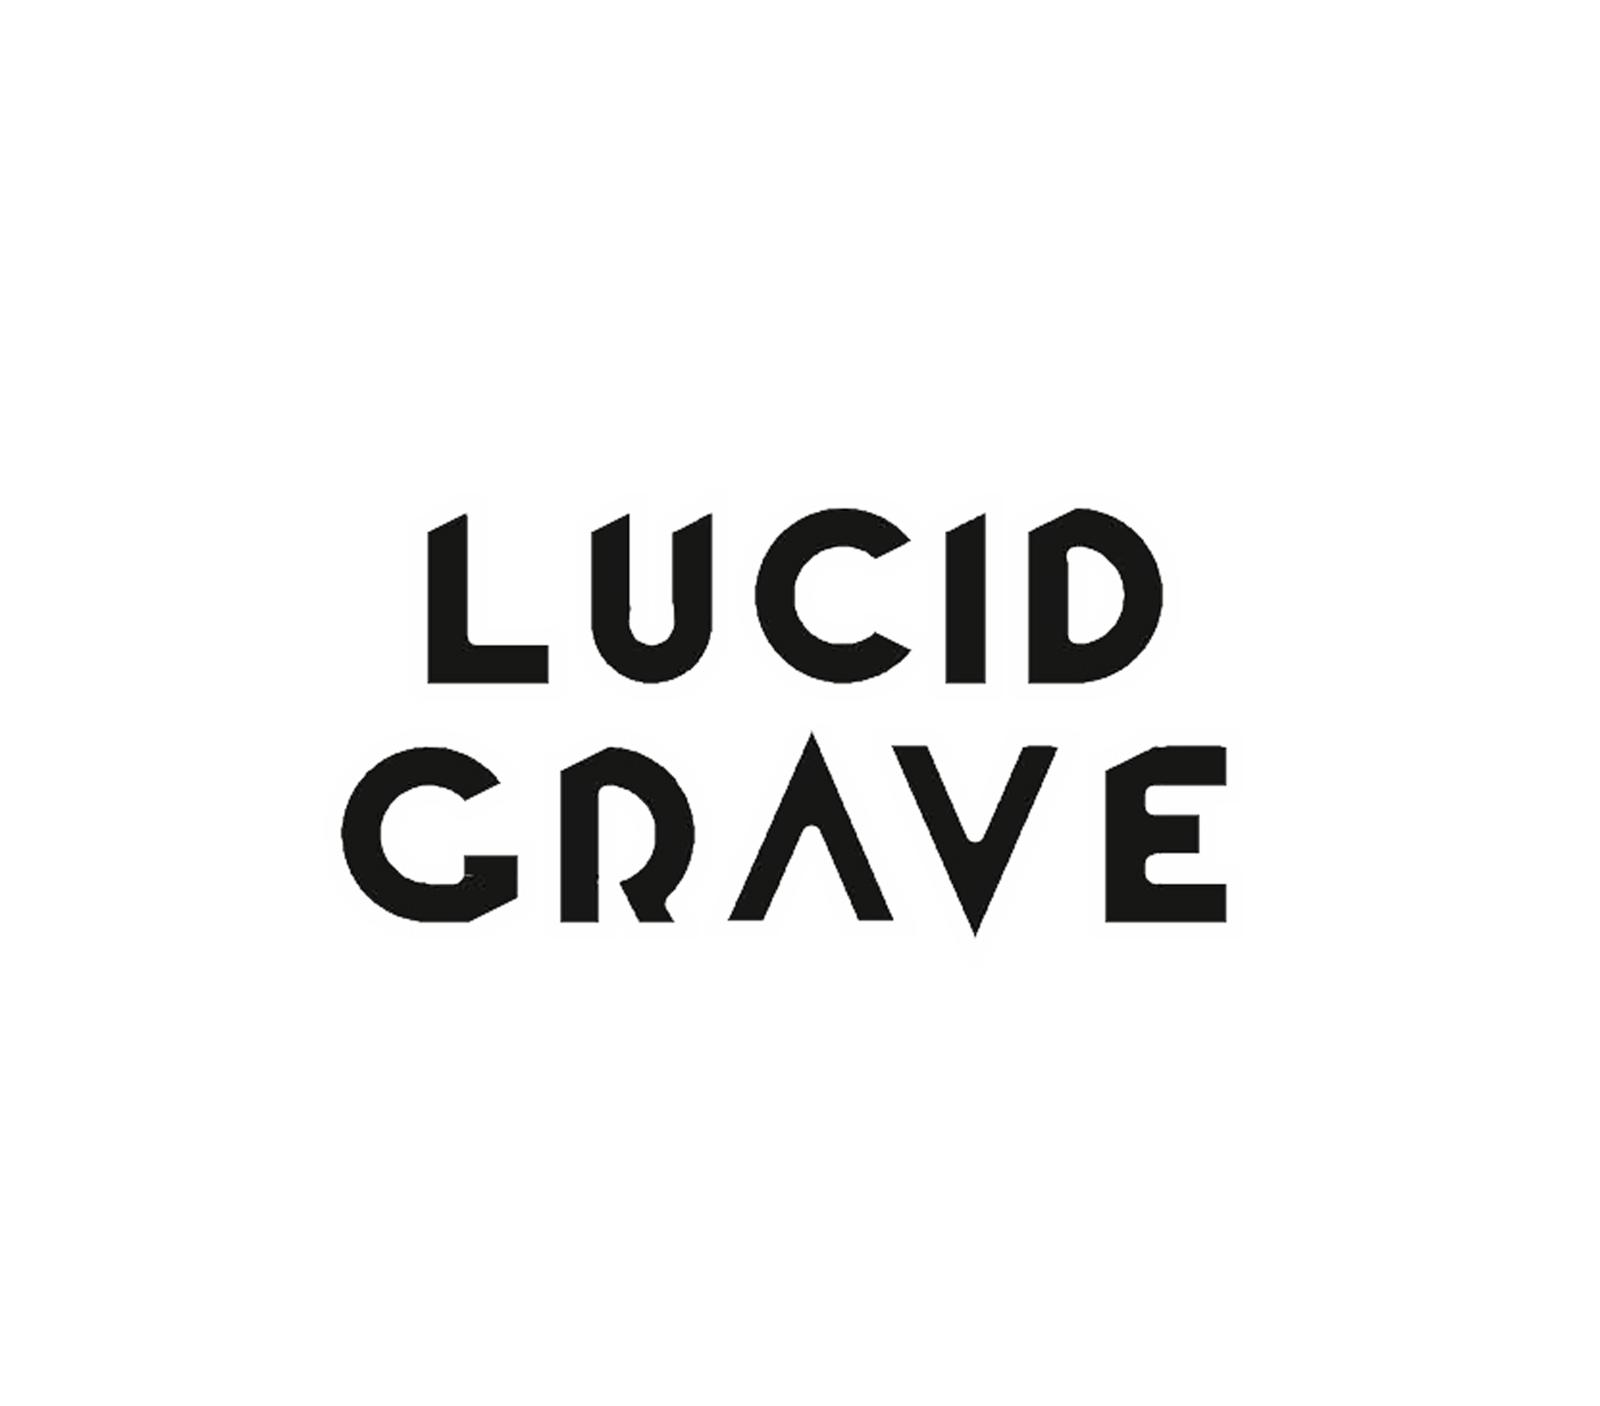 lucid grave demo 2018